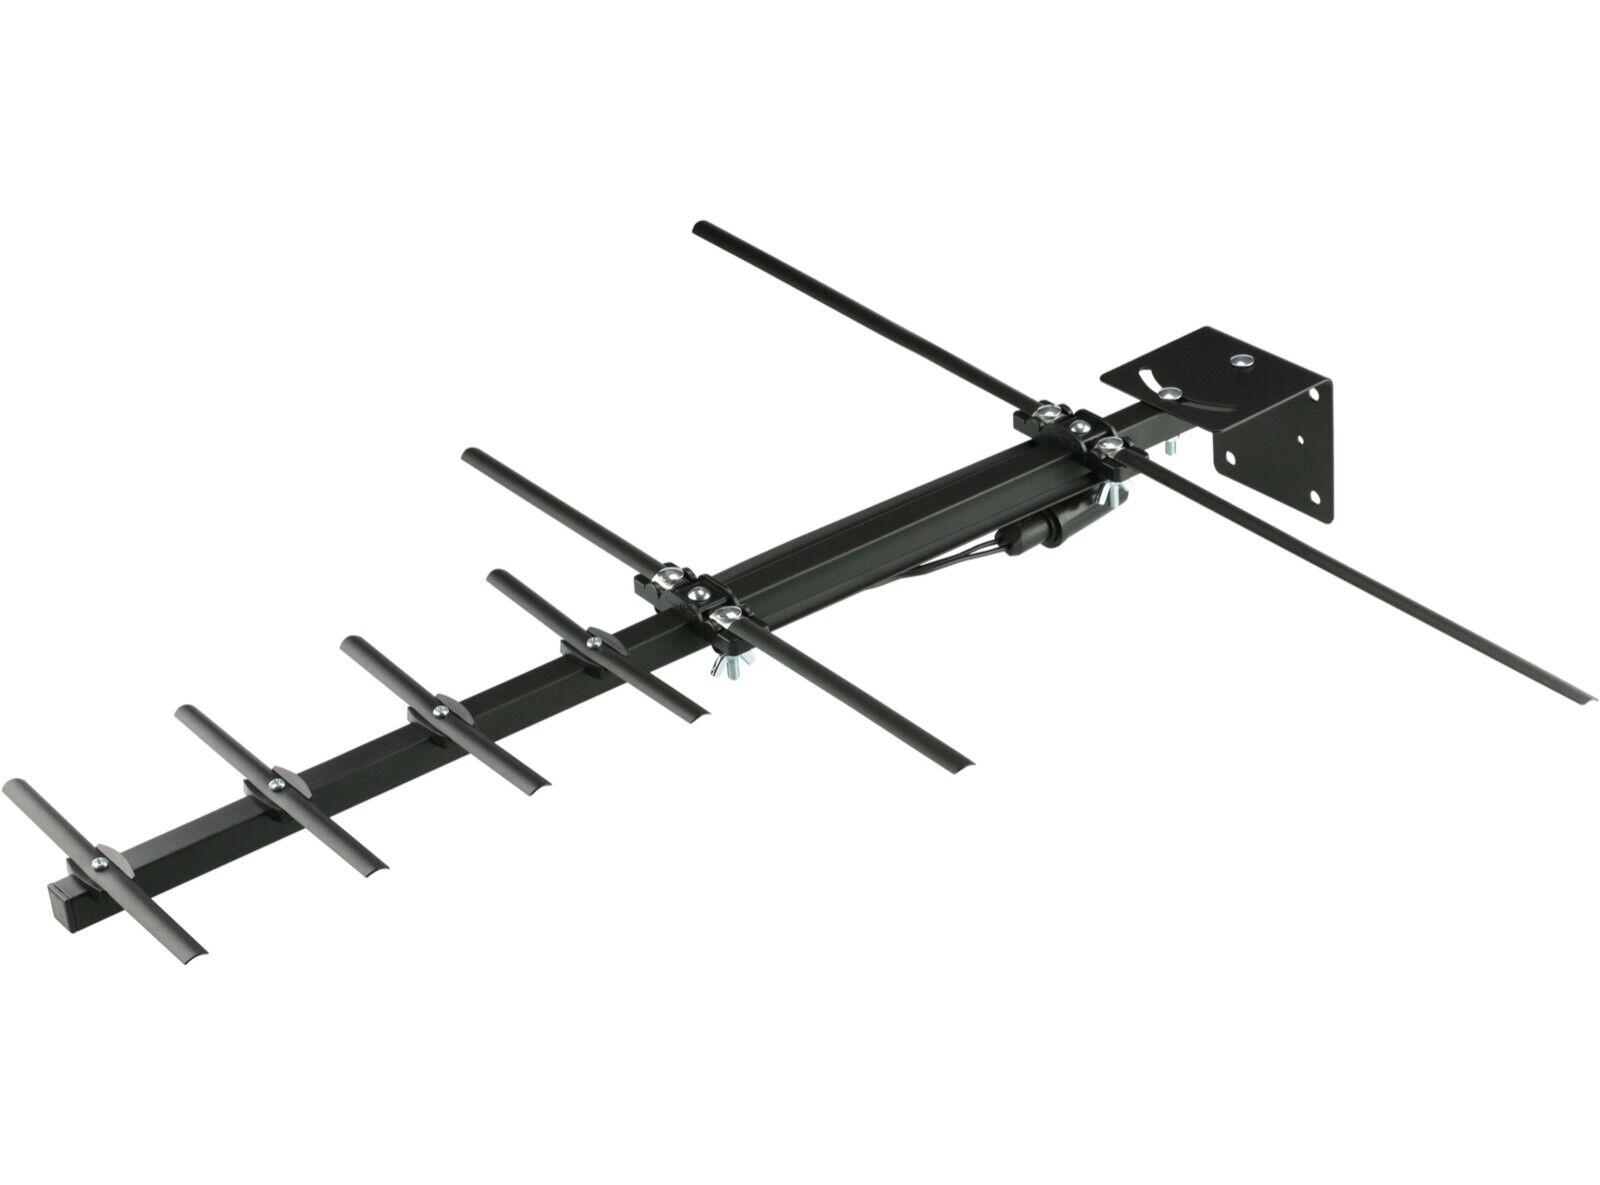 CM-3010HD channelmasteroutlet Channel Master STEALTHtenna Outdoor TV Antenna Directional 50 Mile Range 3010HD